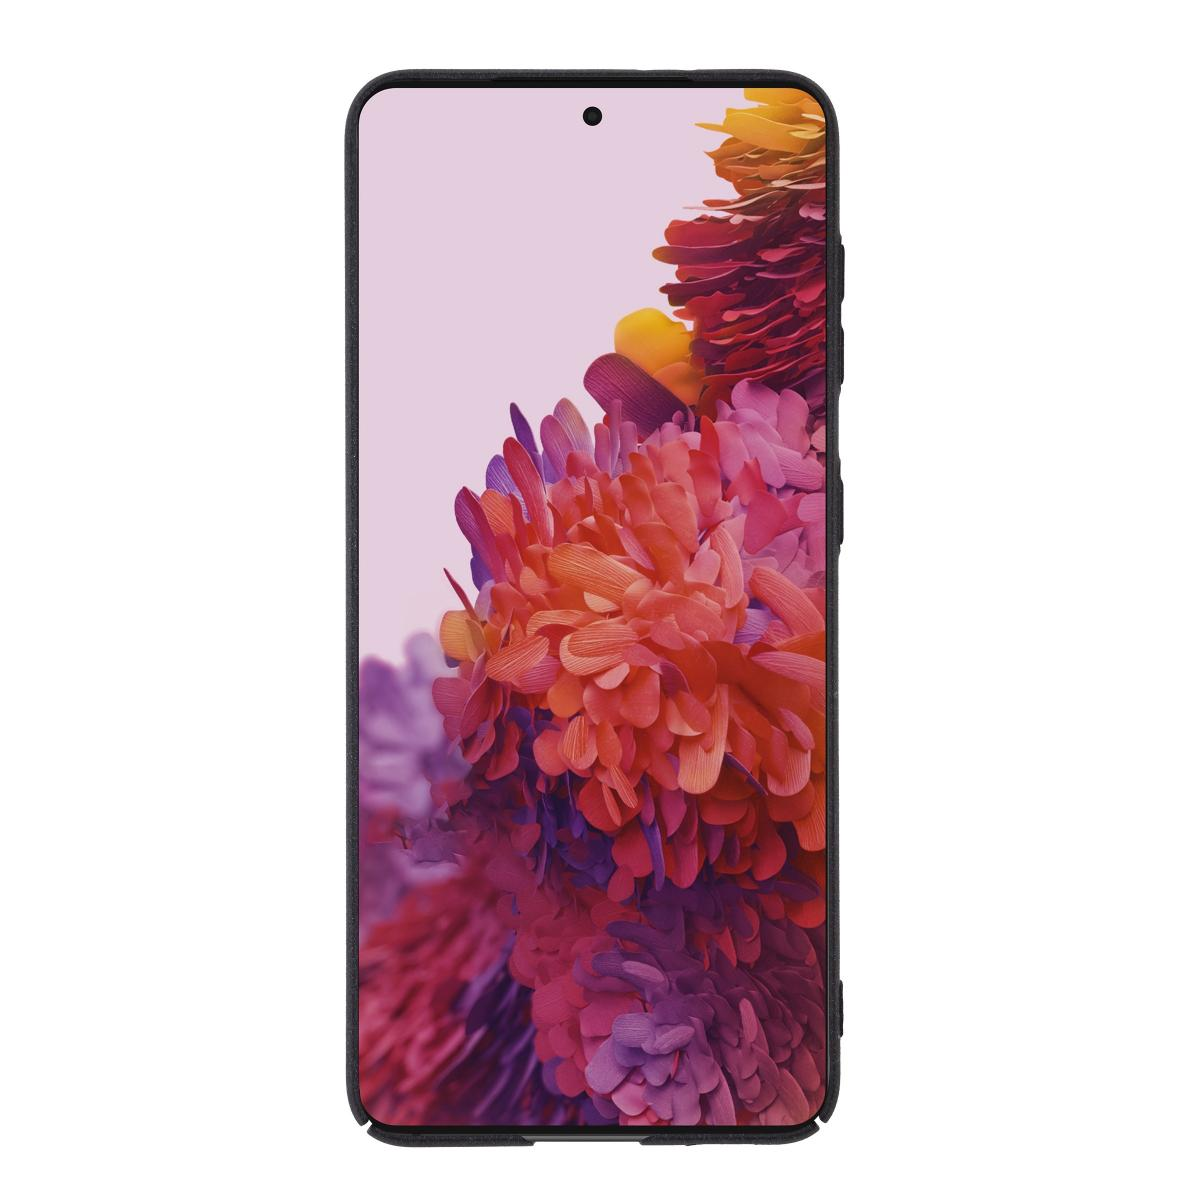 SUPCASE Cosmo iPhone 12 & 12 Pro Marmor - TheMobileStore